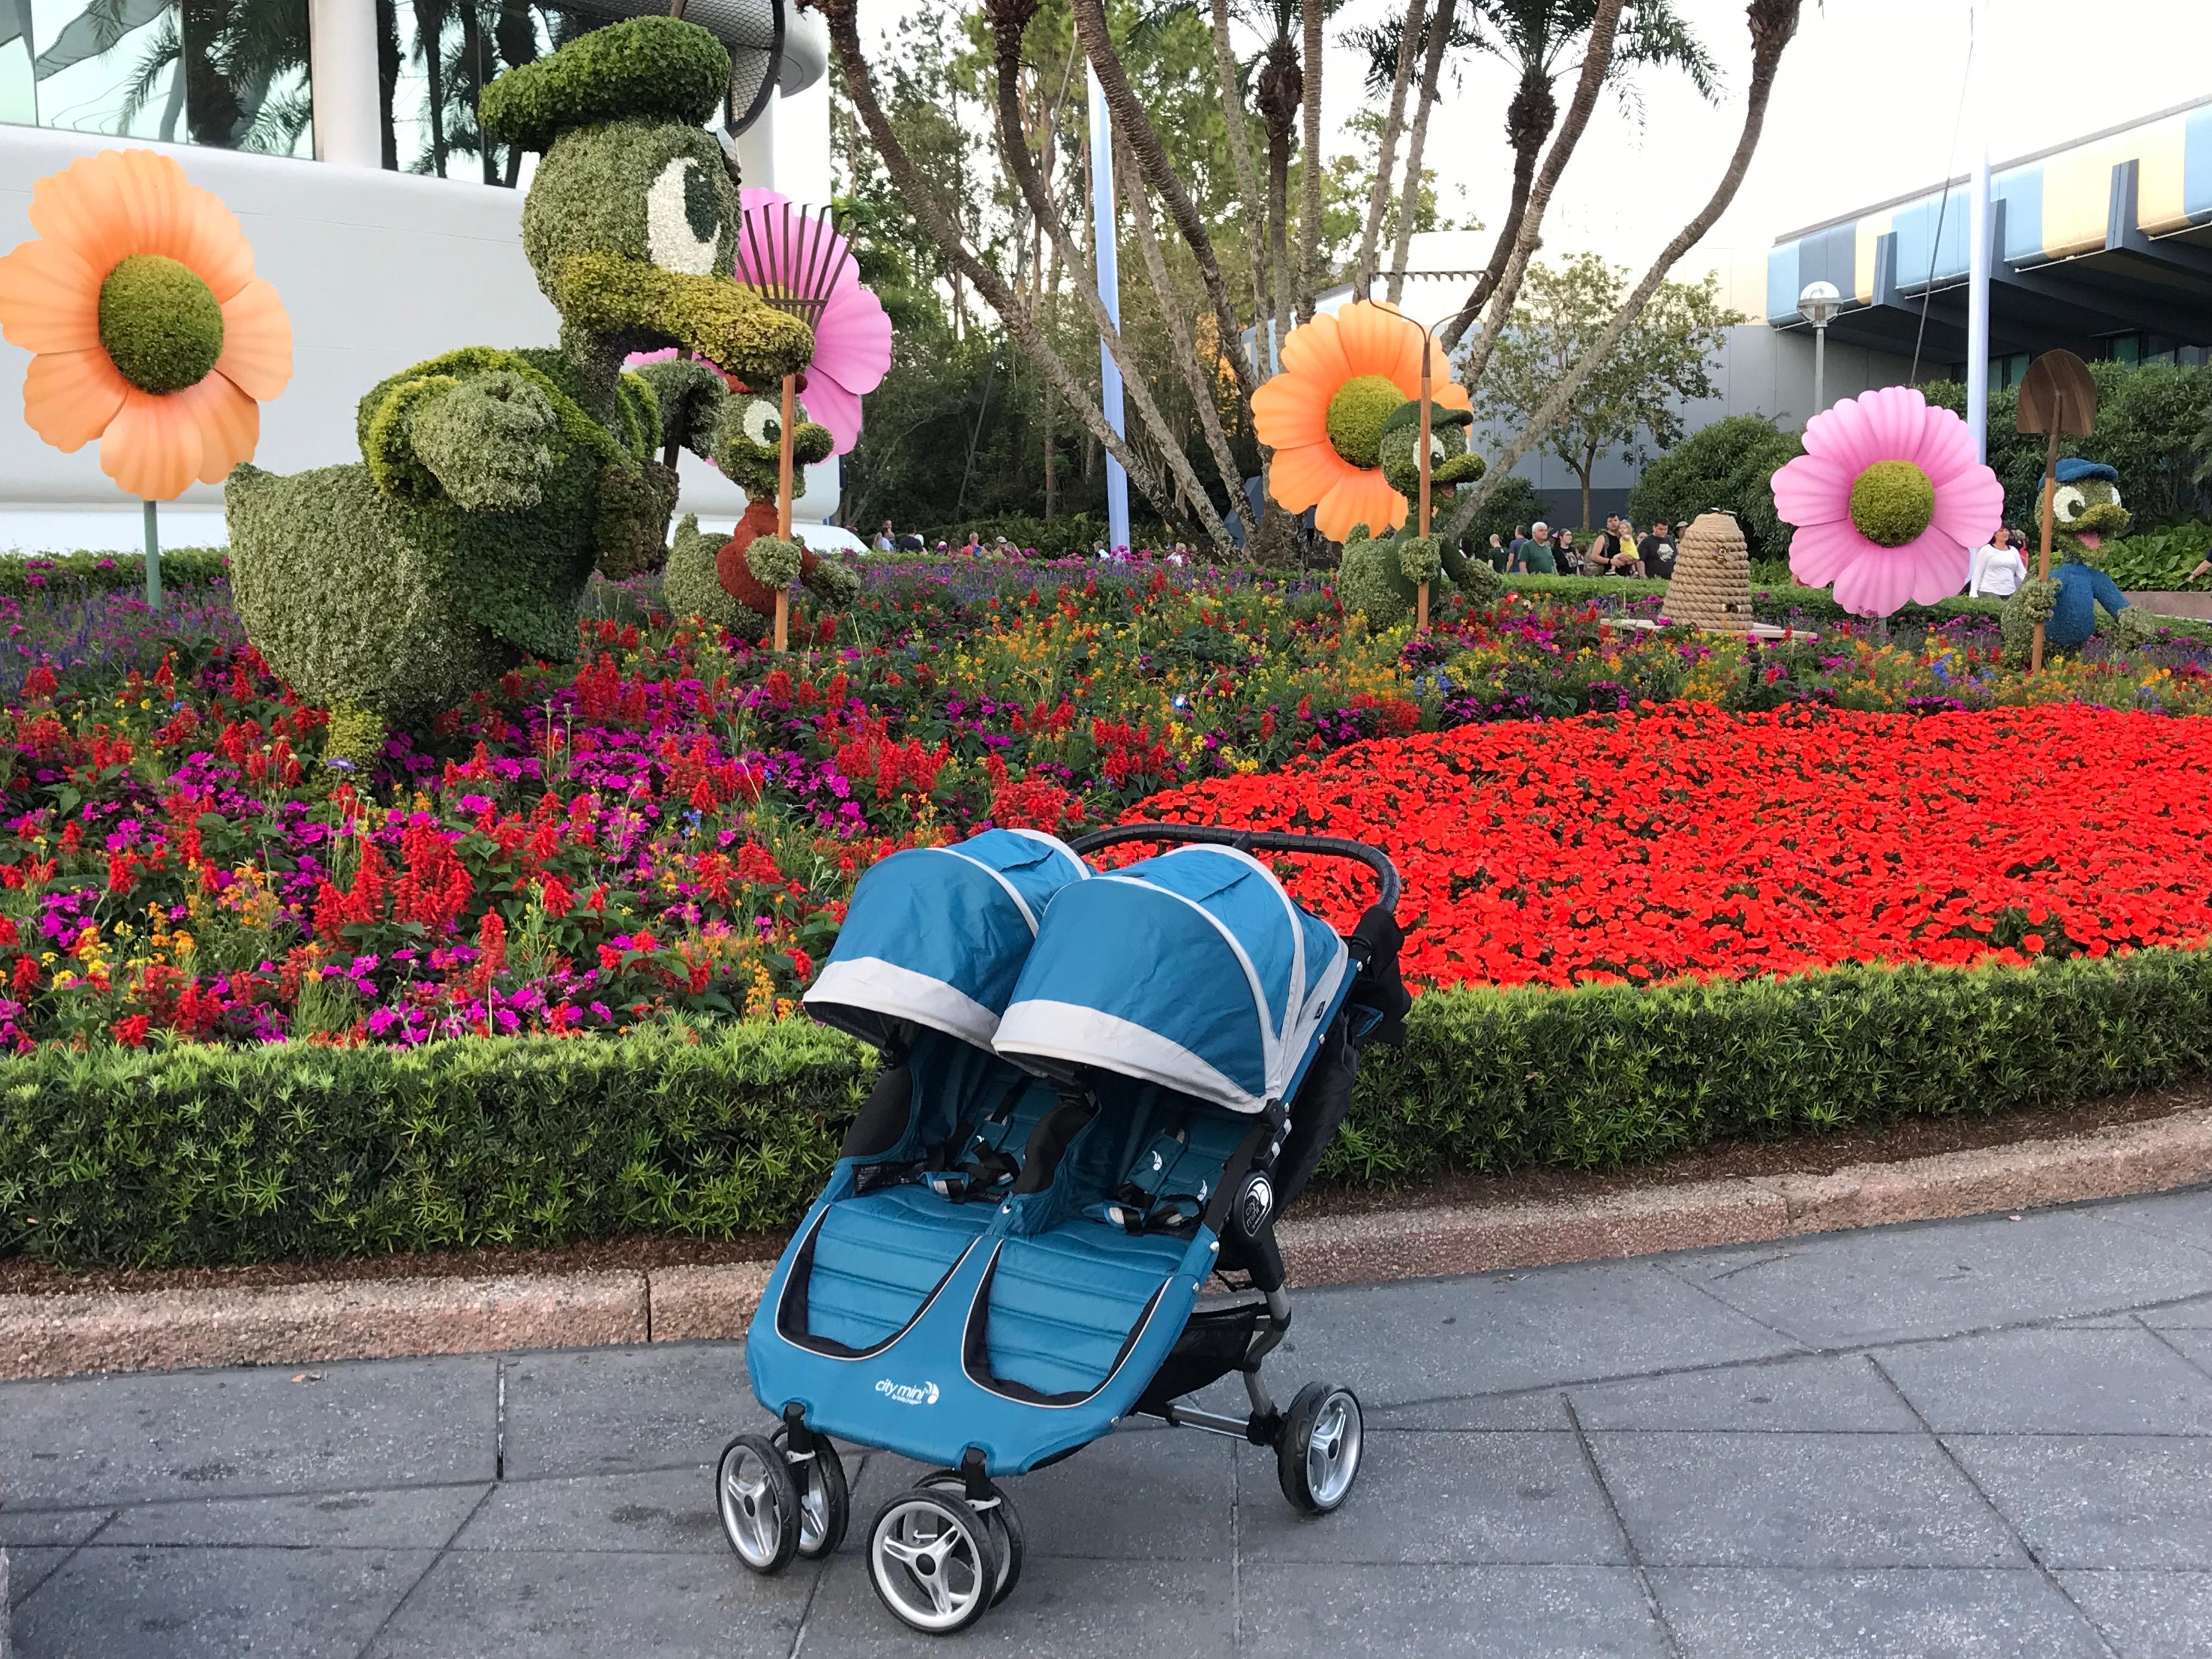 Stroller Rentals Disney image 24